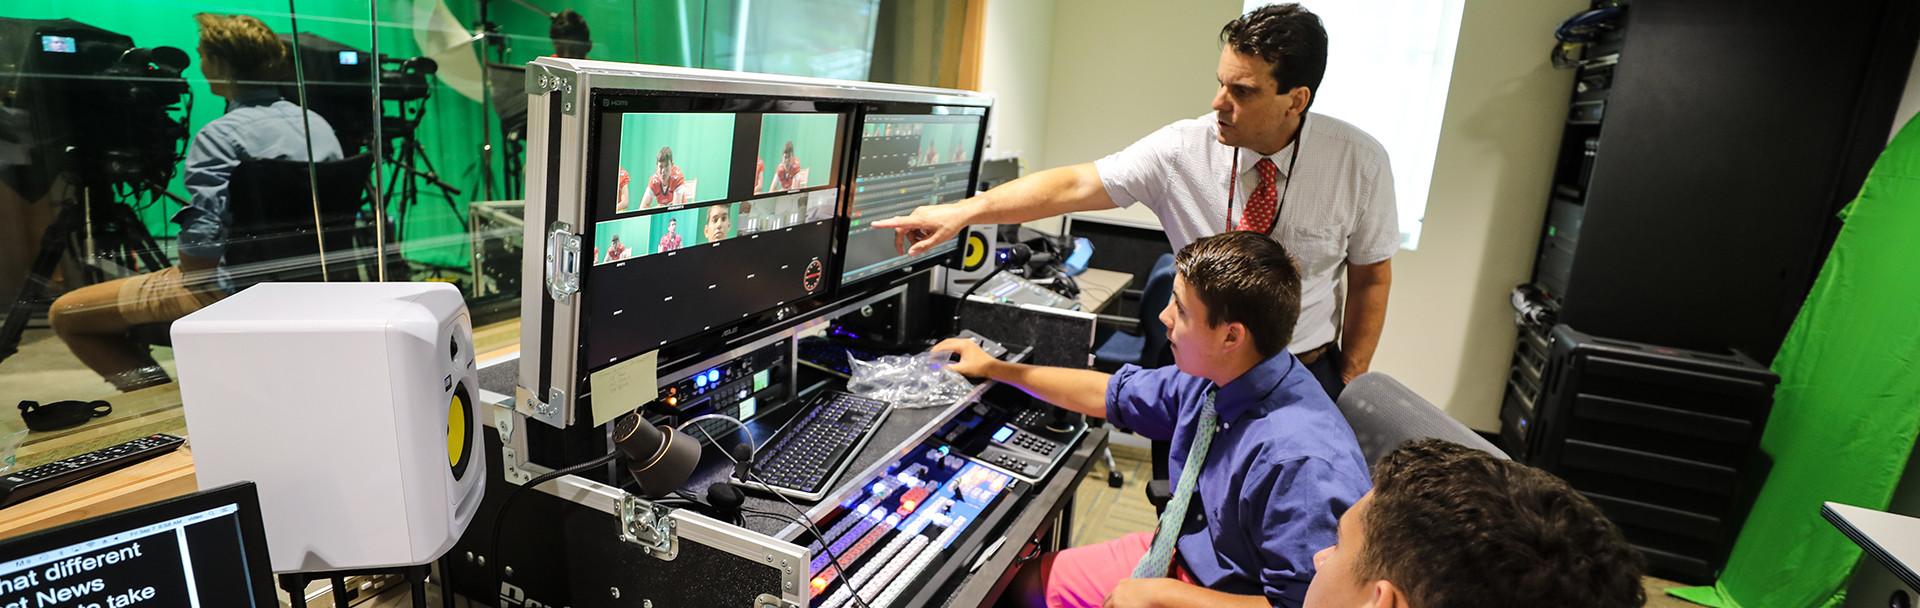 Educatius-SaintAndrewsSchool-Boarding-MediaLabGreenScreen-2019-Banner